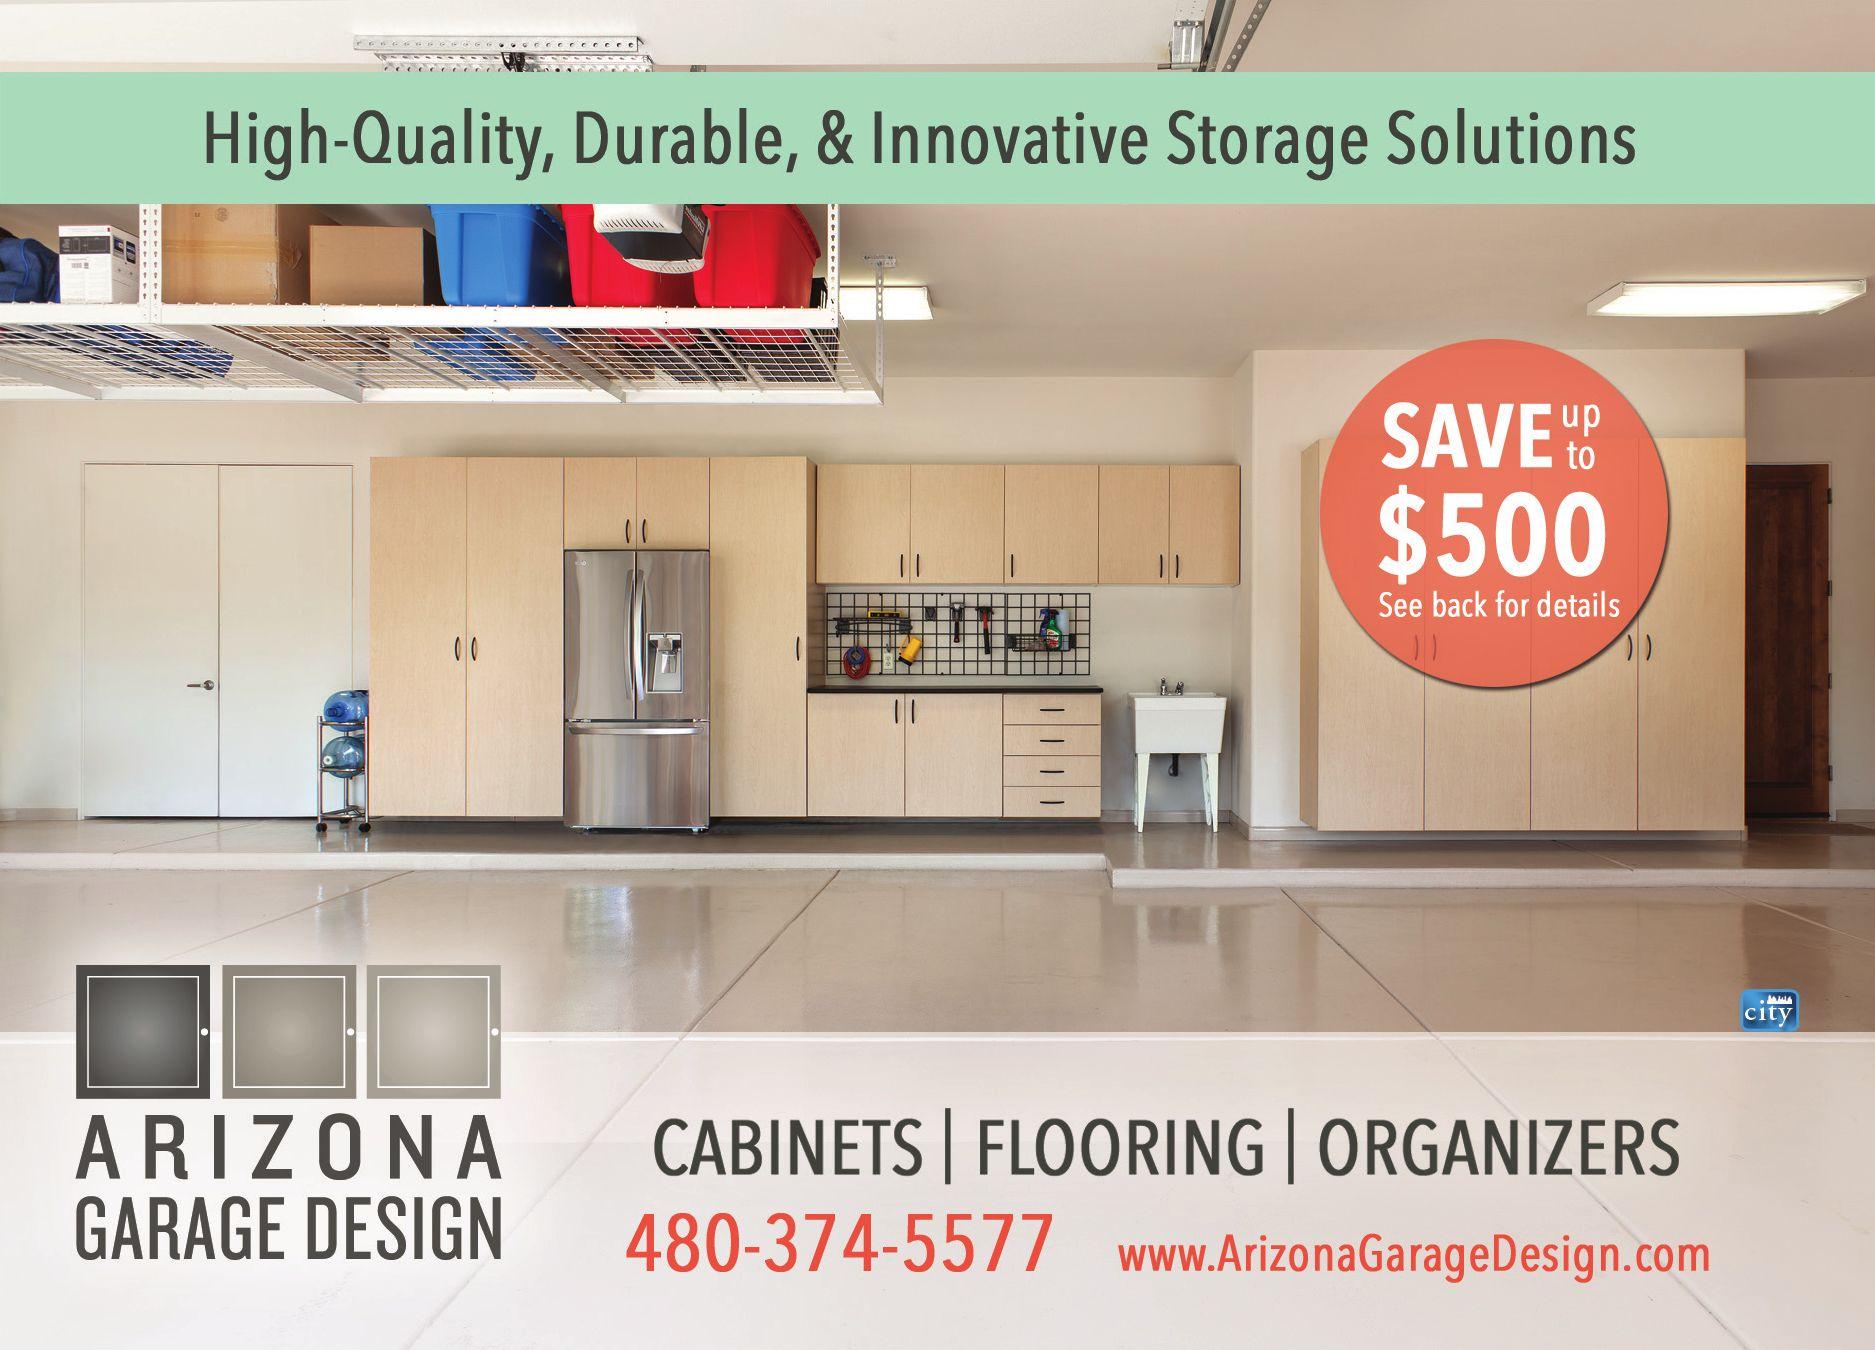 arizona garage design